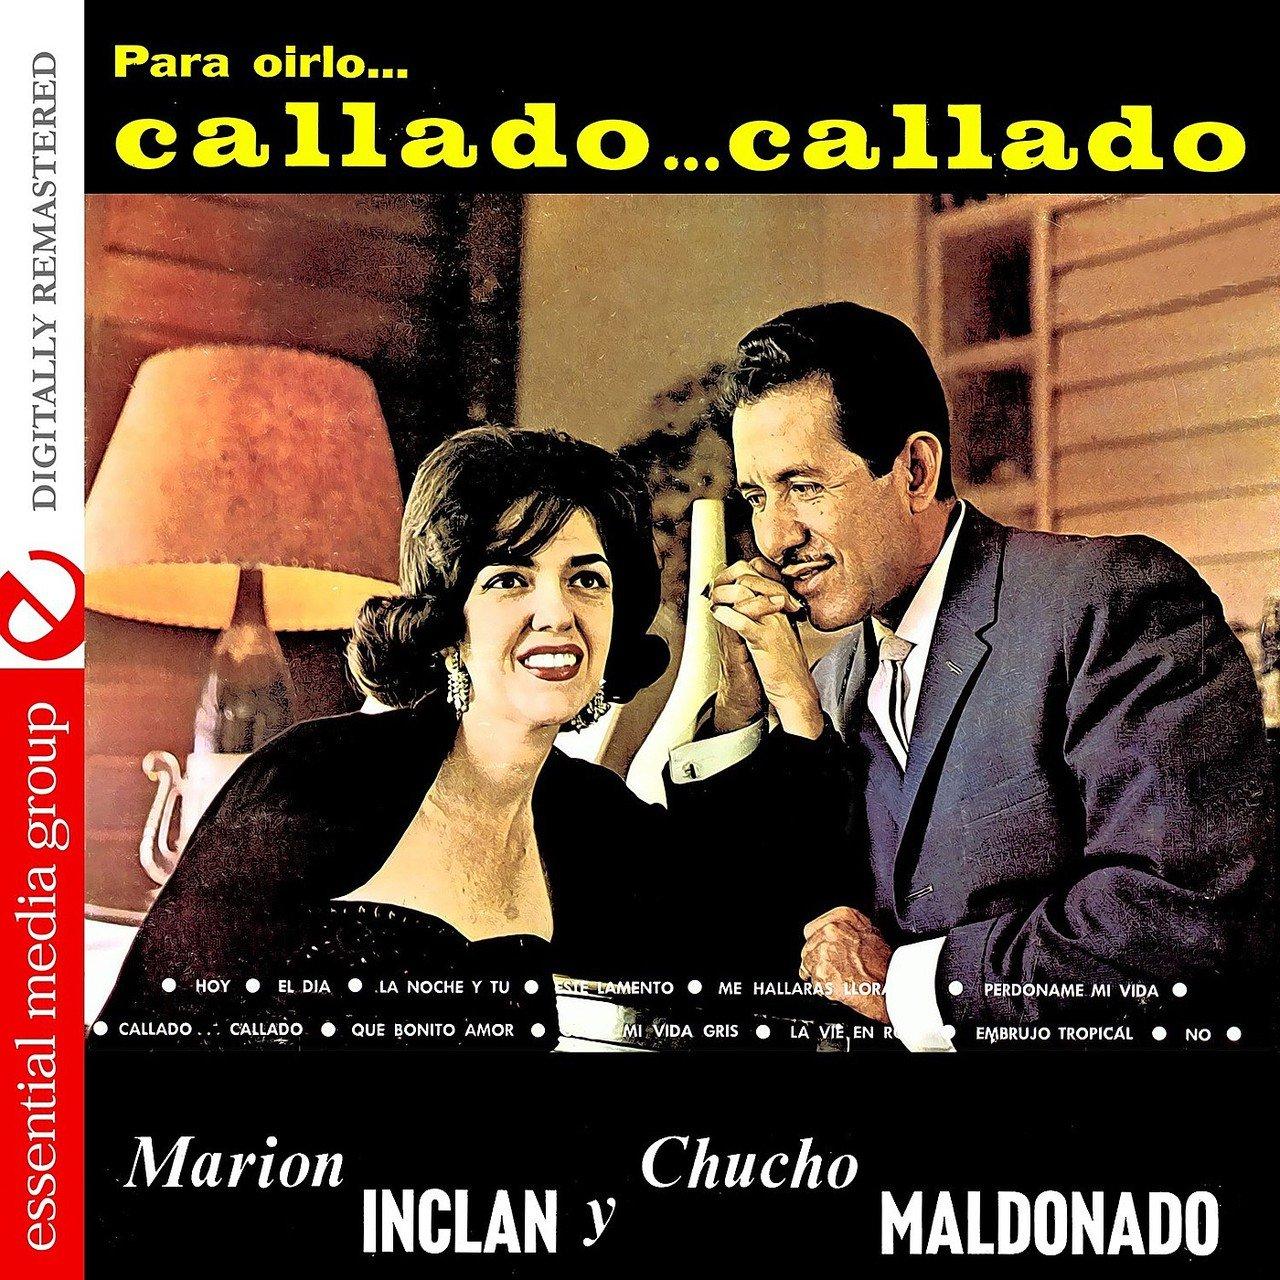 Listen To Callado Callado Digitally Remastered By Marion Inclan